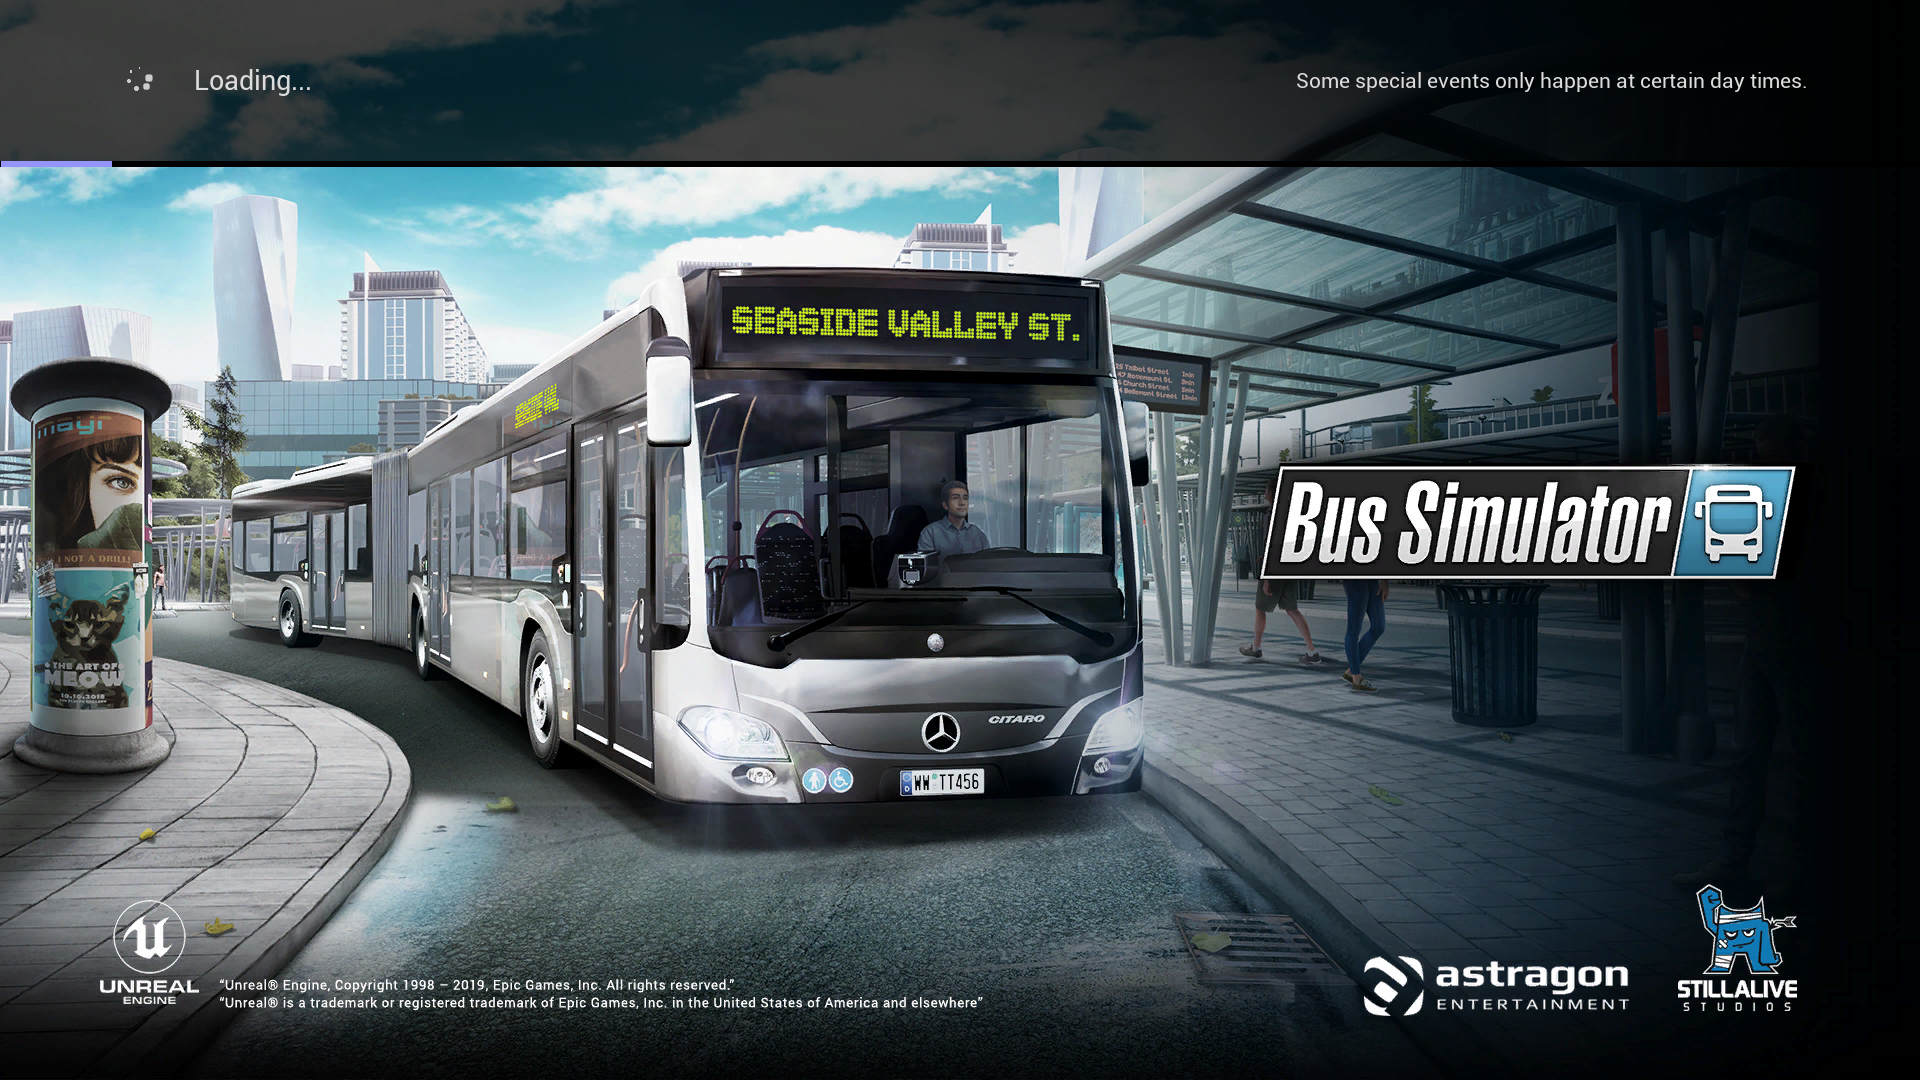 Bus Simulator Loading Page